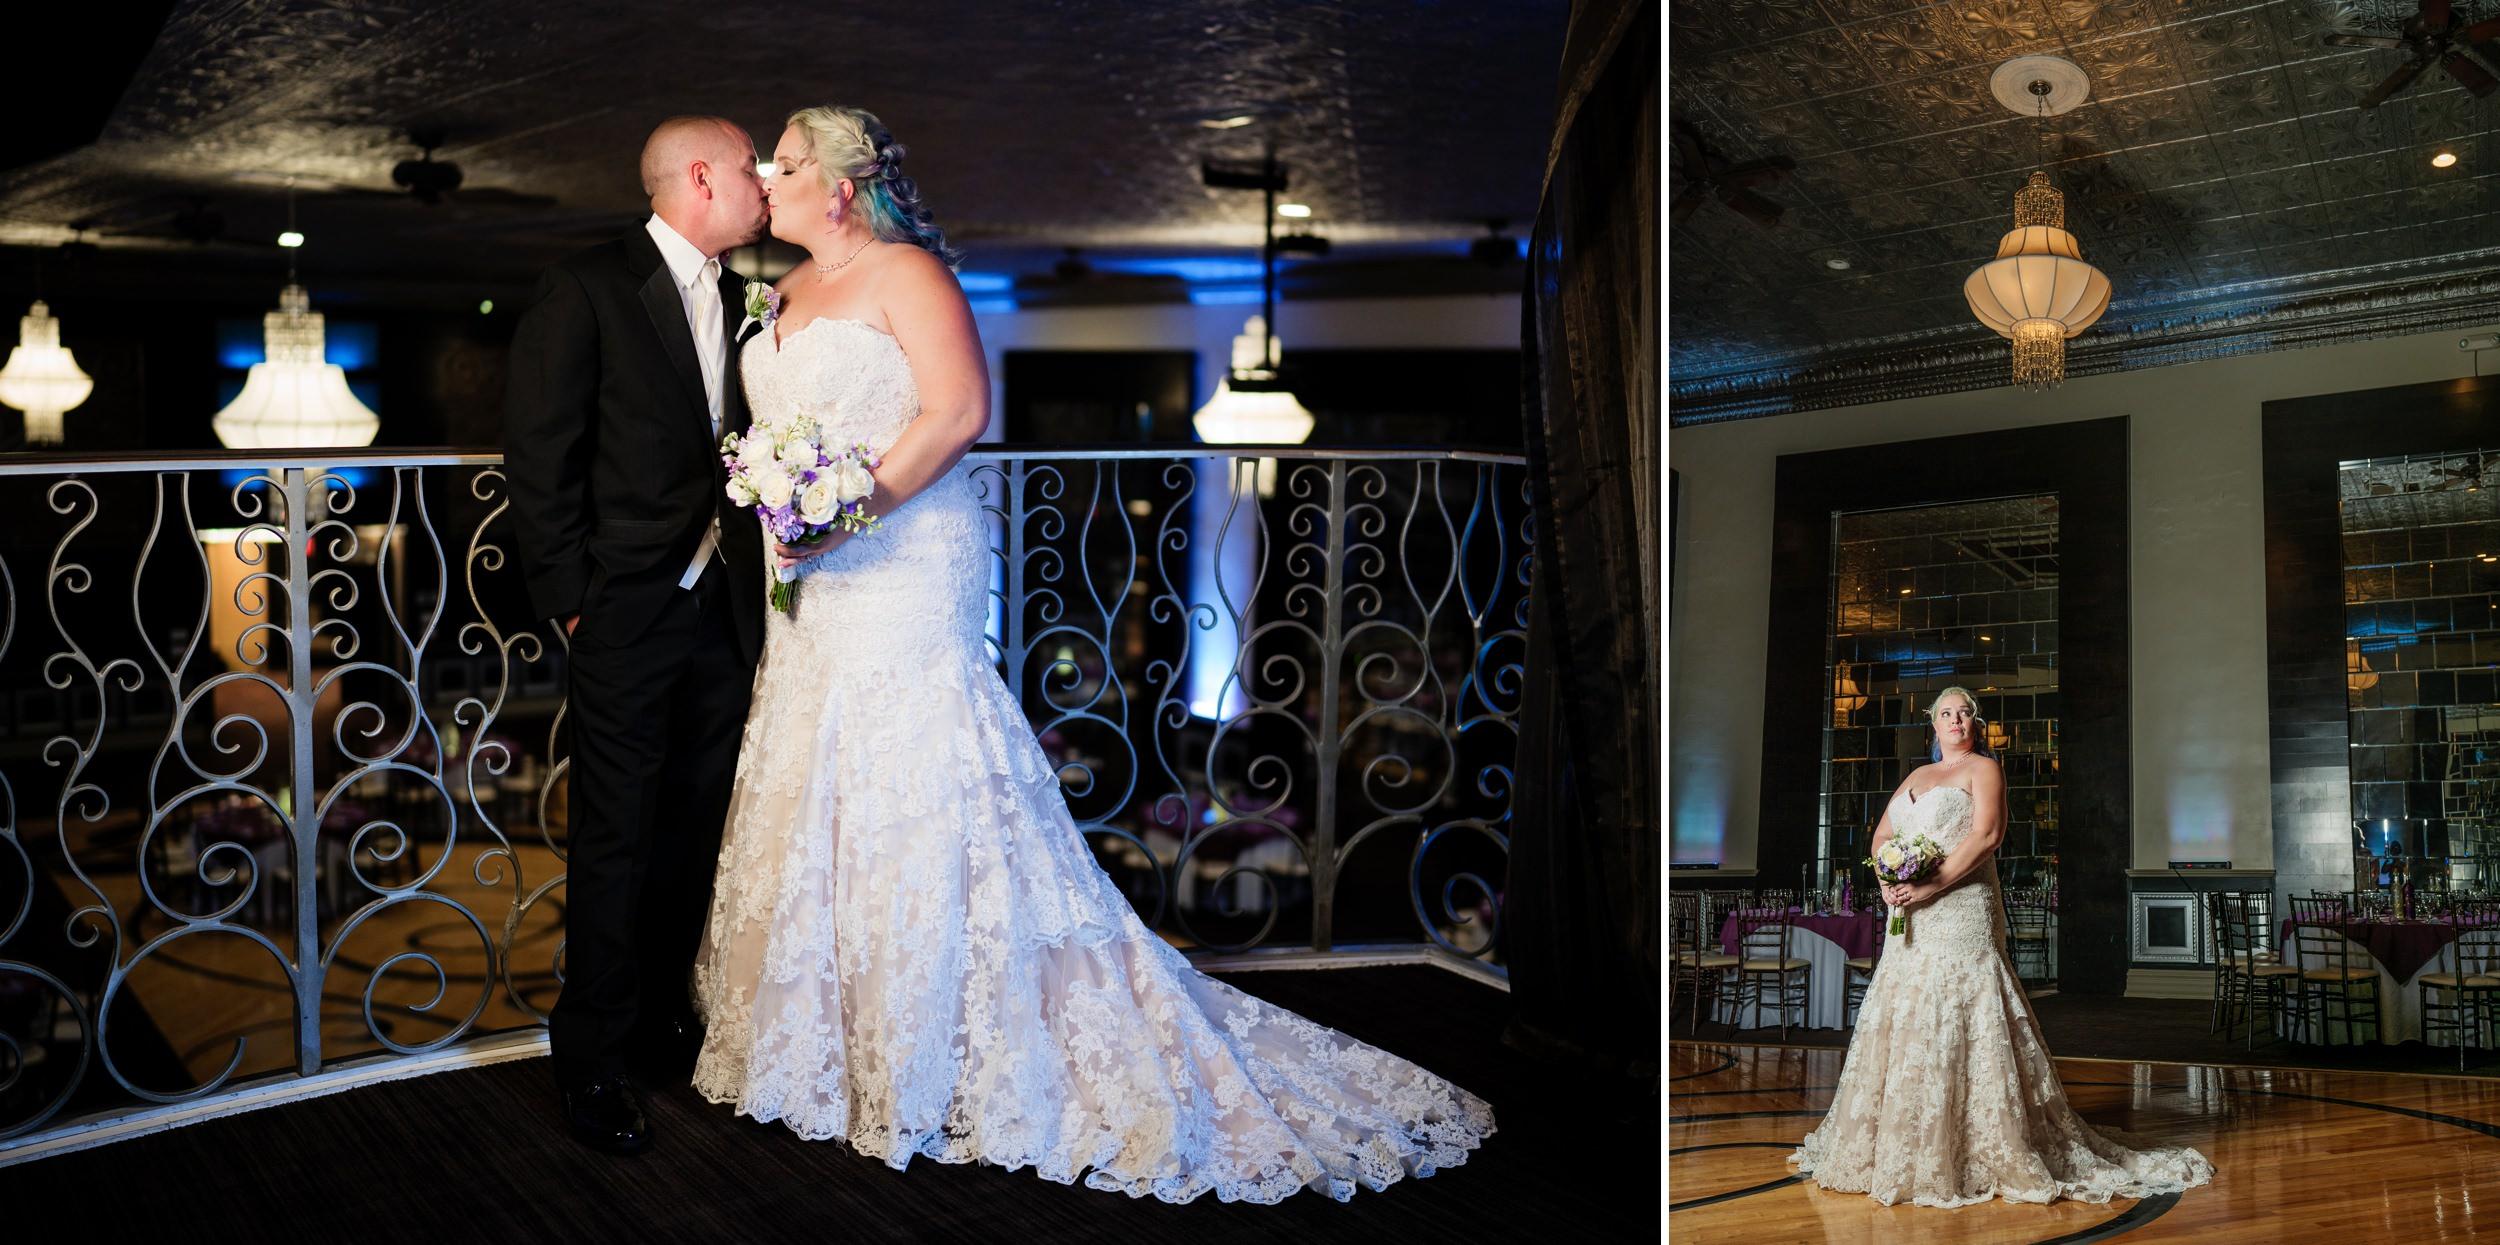 Wedding photos inside the The Allure ballroom.